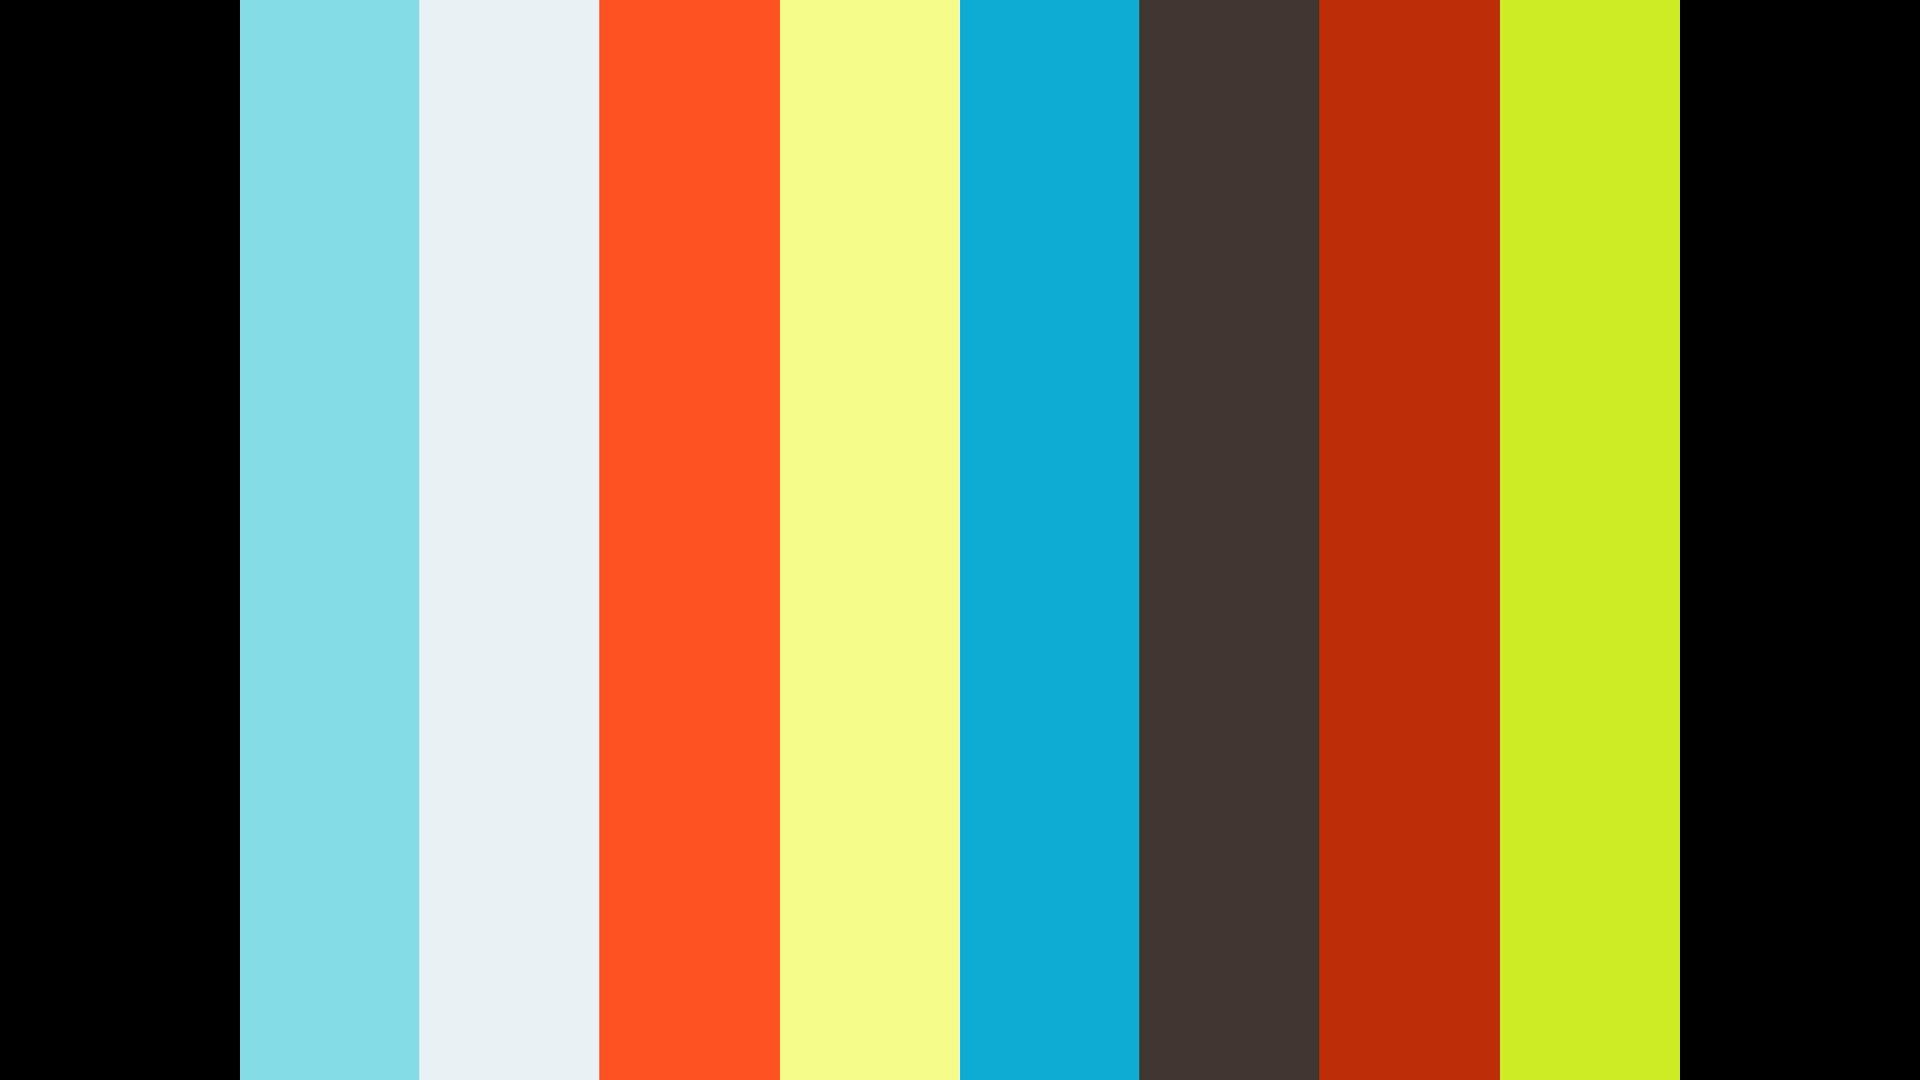 DermaSet Customer Feedback 04/21/2017